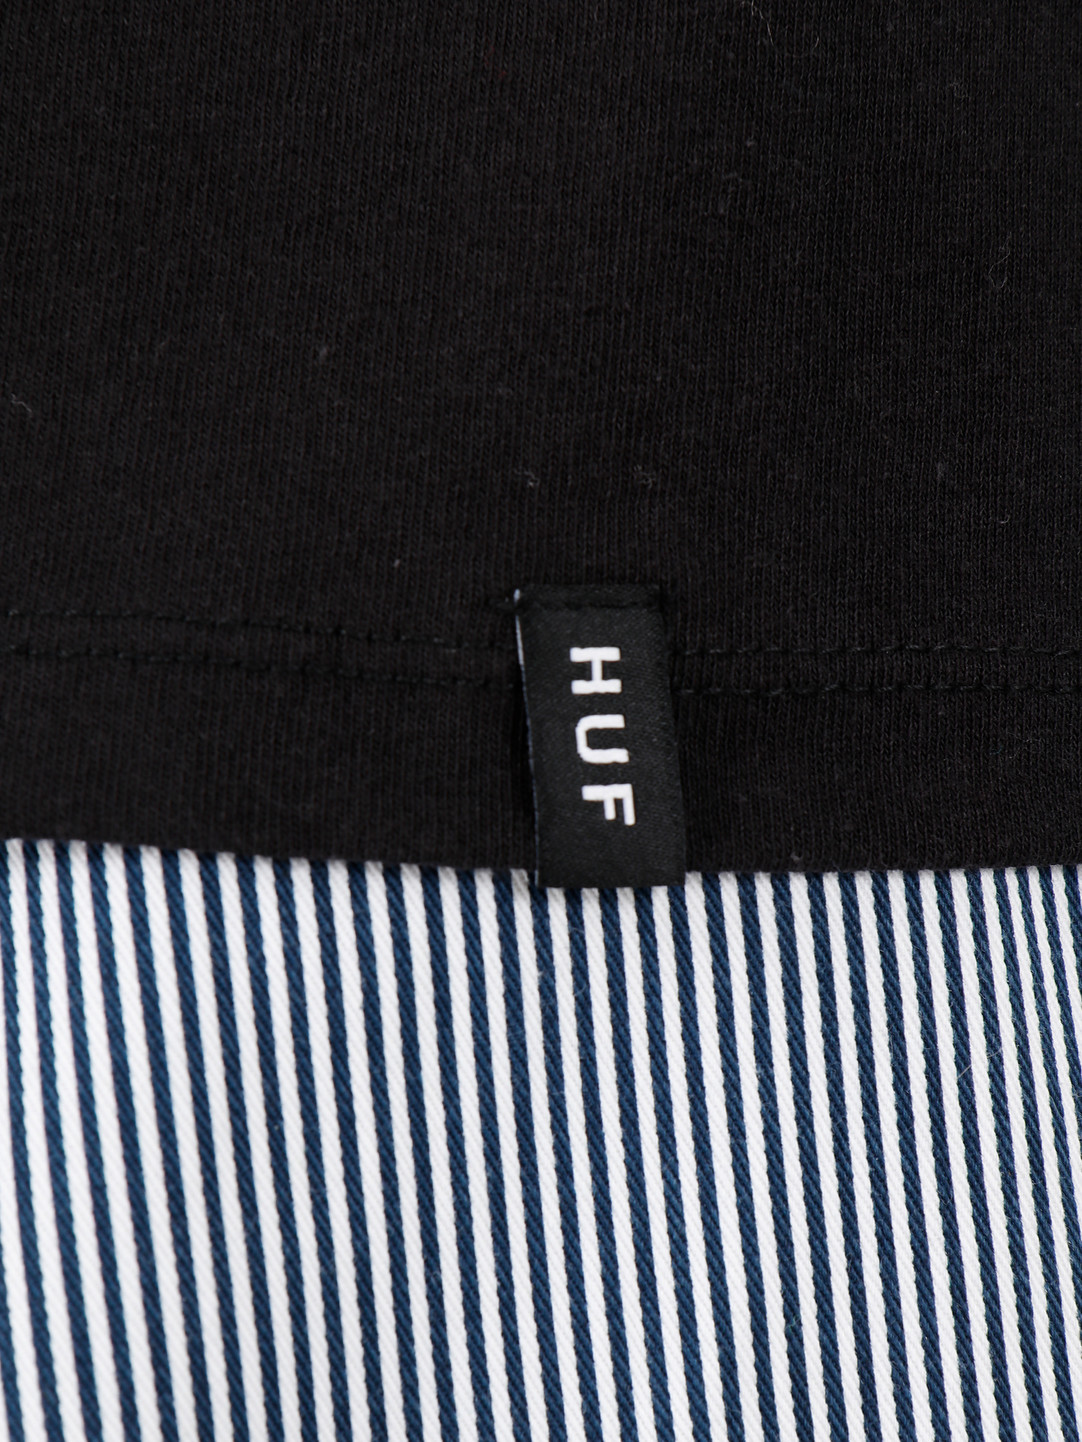 HUF HUF Short Term Longsleeve Pocket Tee Black Ts00886Black